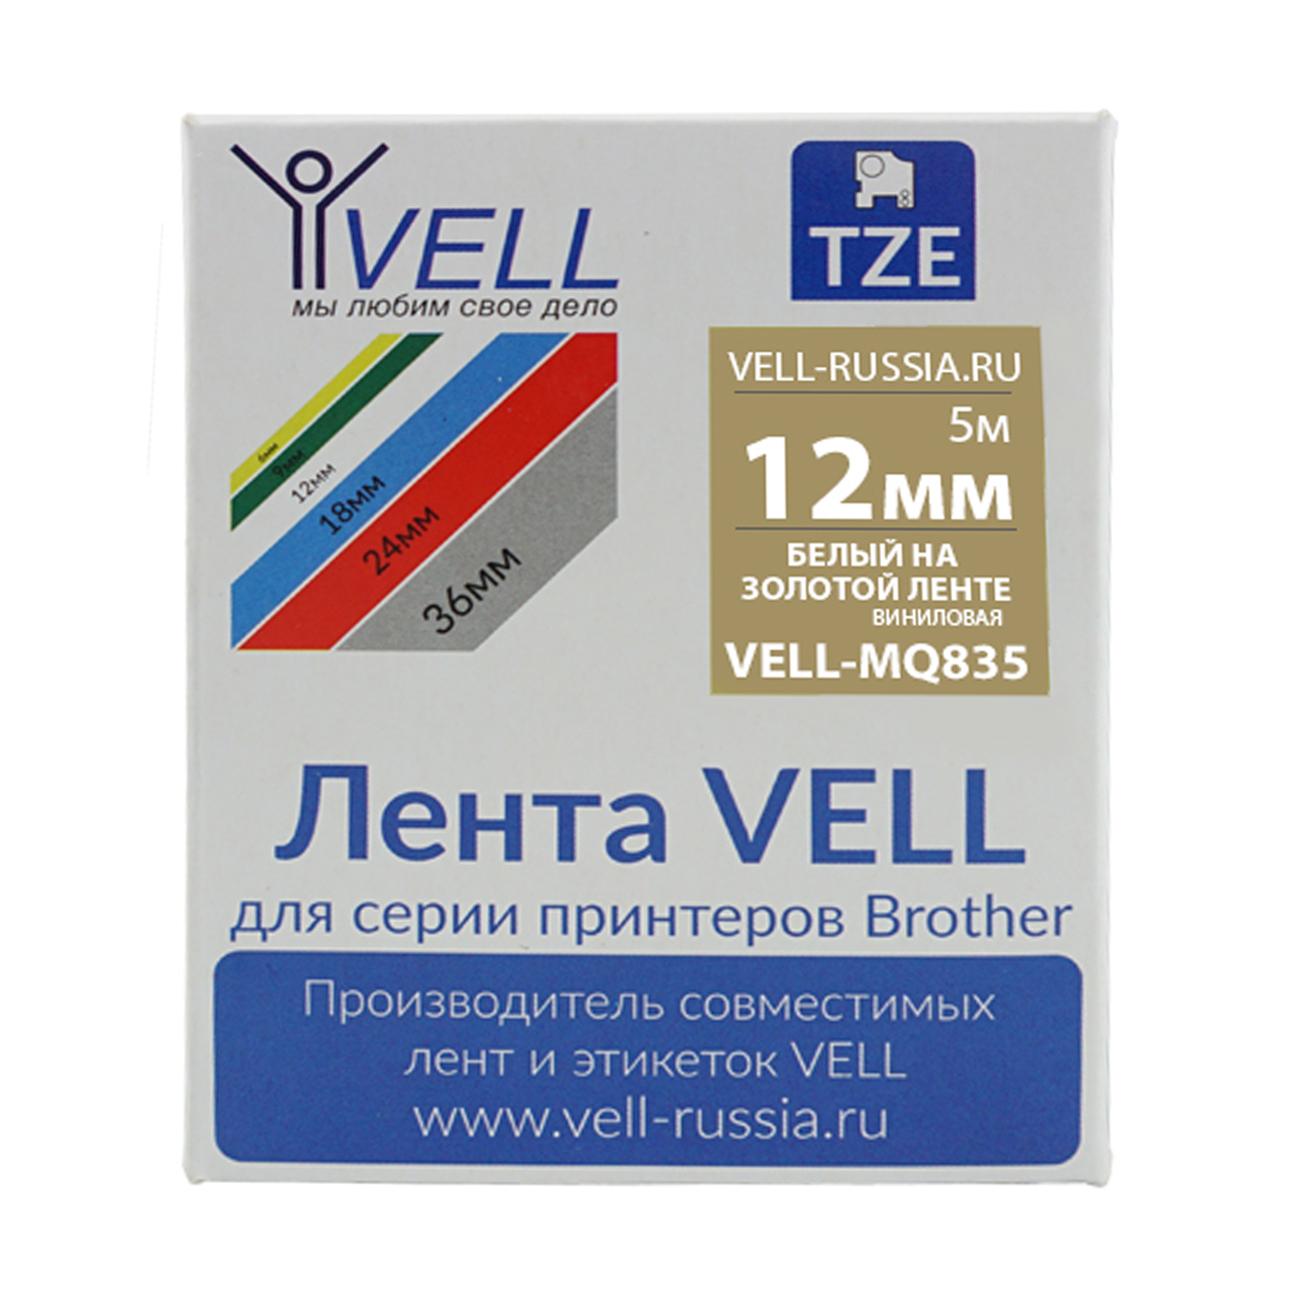 Фото Лента Vell MQ-835 (12 мм, белый на золотом) для PT 1010/1280/D200/H105/E100/ D600/E300/2700/ P700/E550/9700 {Vell-MQ835}